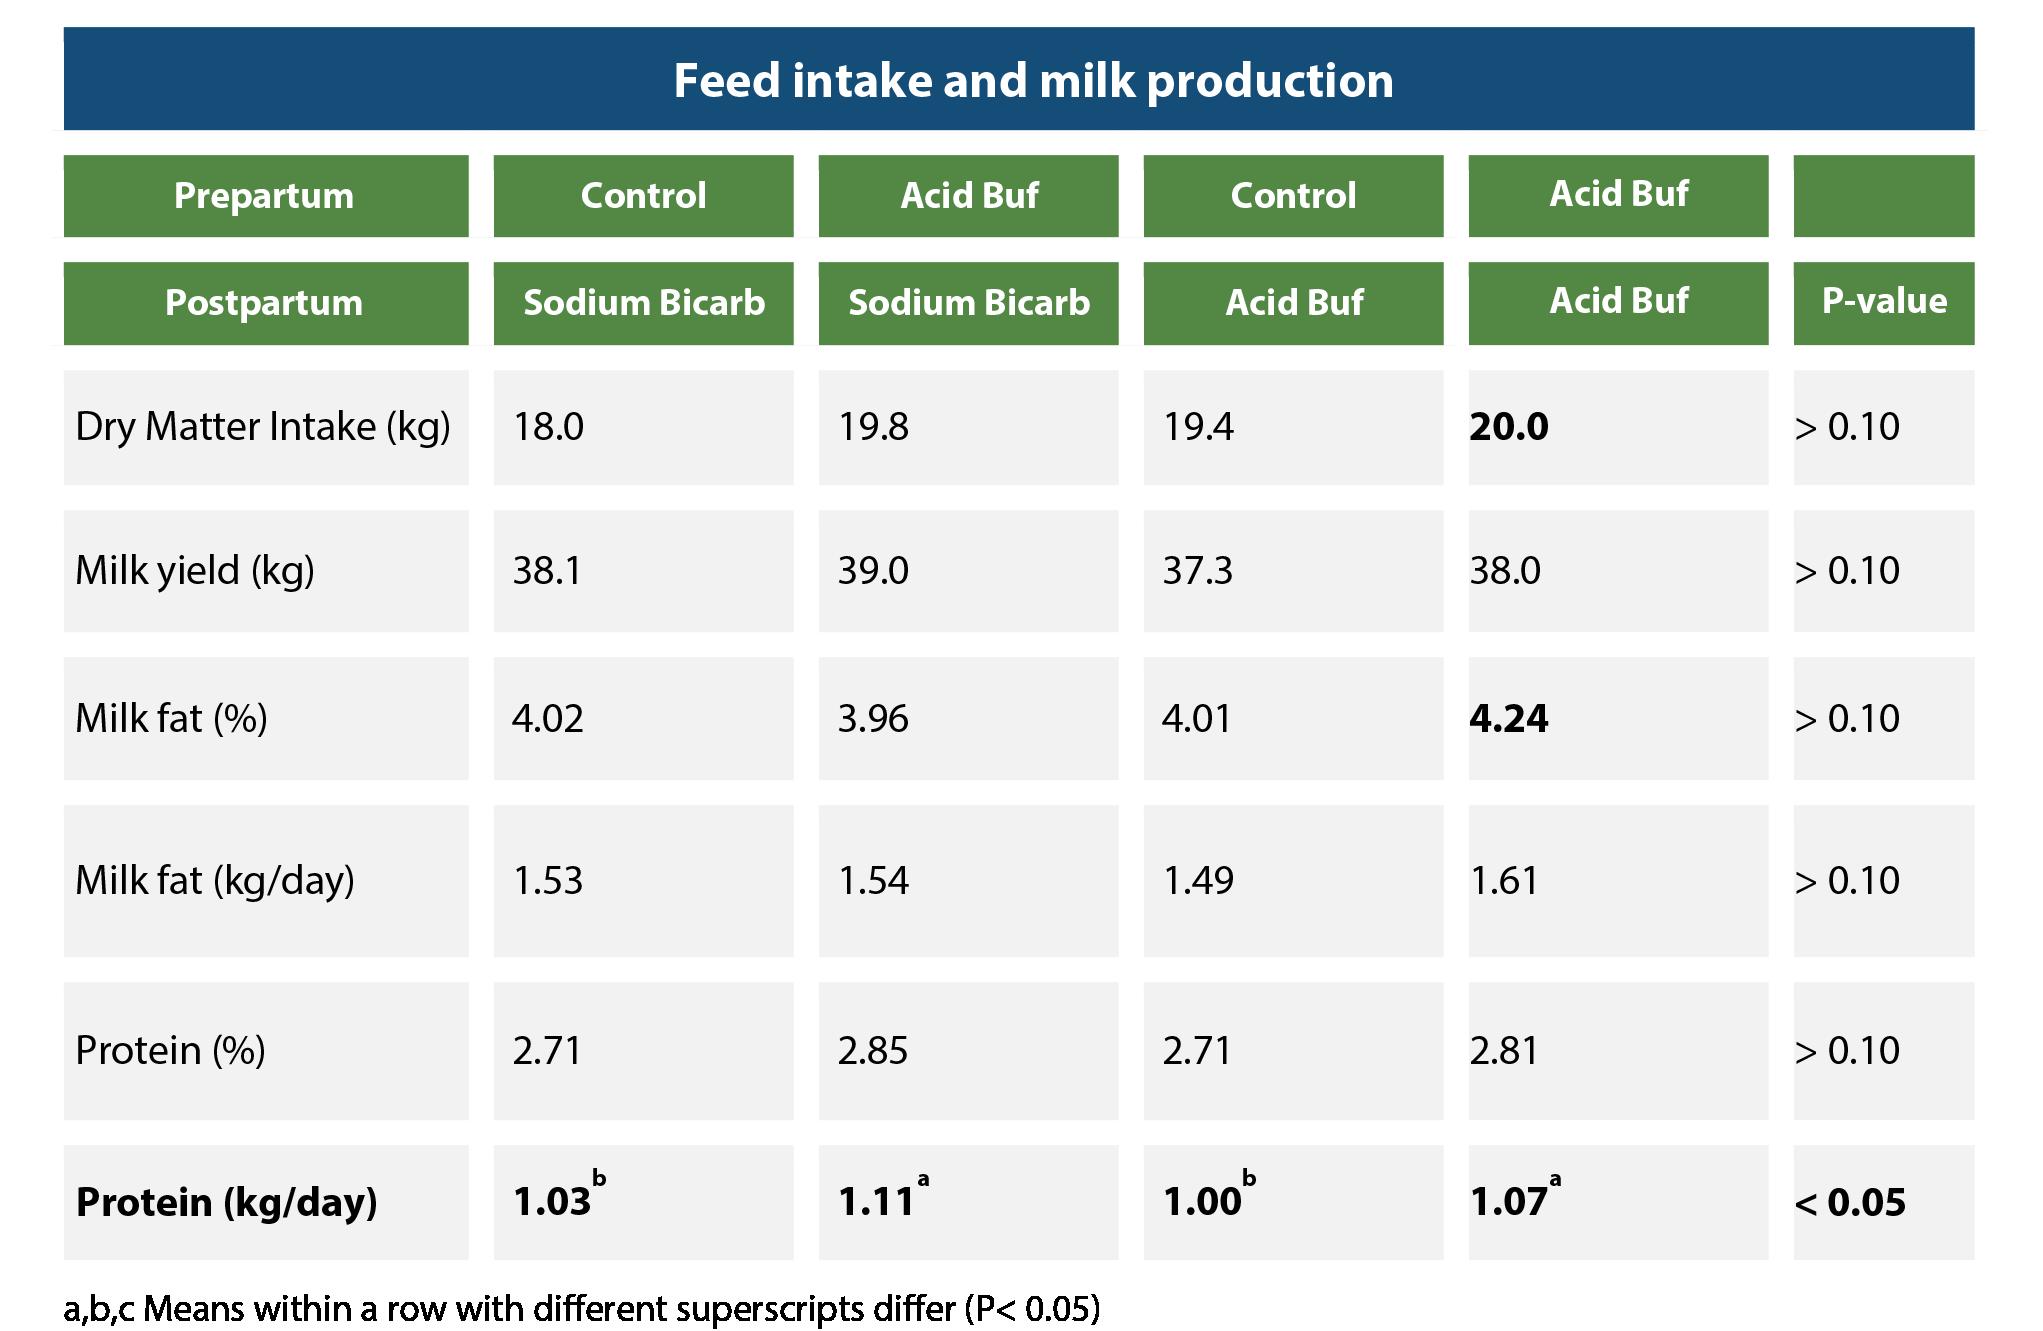 CSM_AcidBuf - Feed intake and milk production